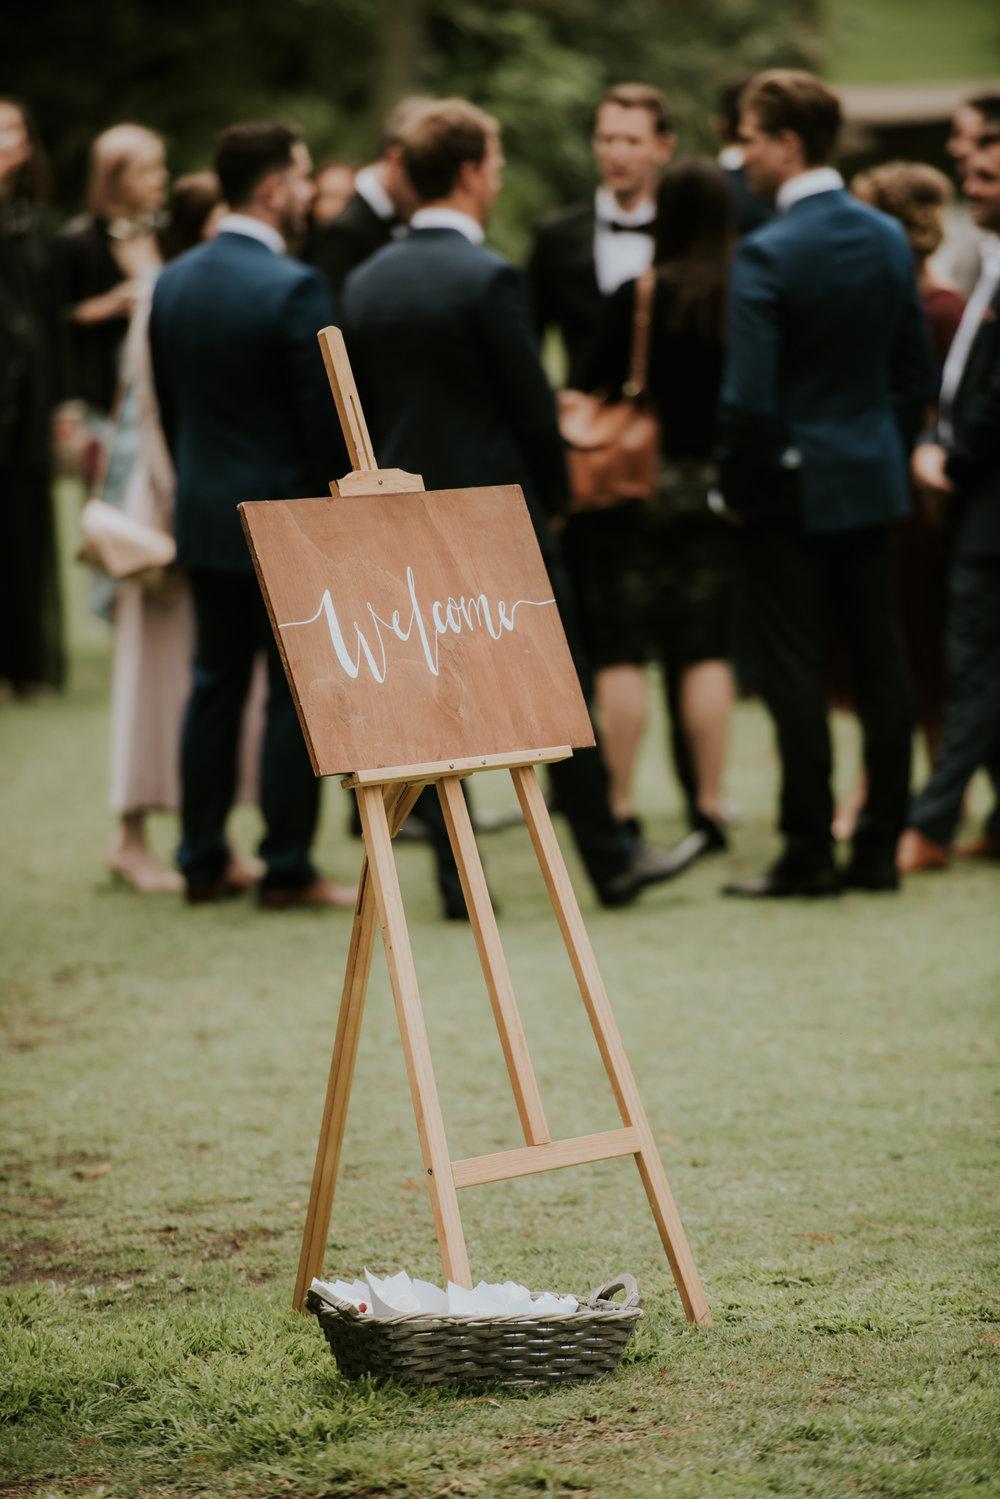 Brisbane Wedding Photographer | Engagement-Elopement Photography | Factory51-City Botantic Gardens Wedding-20.jpg